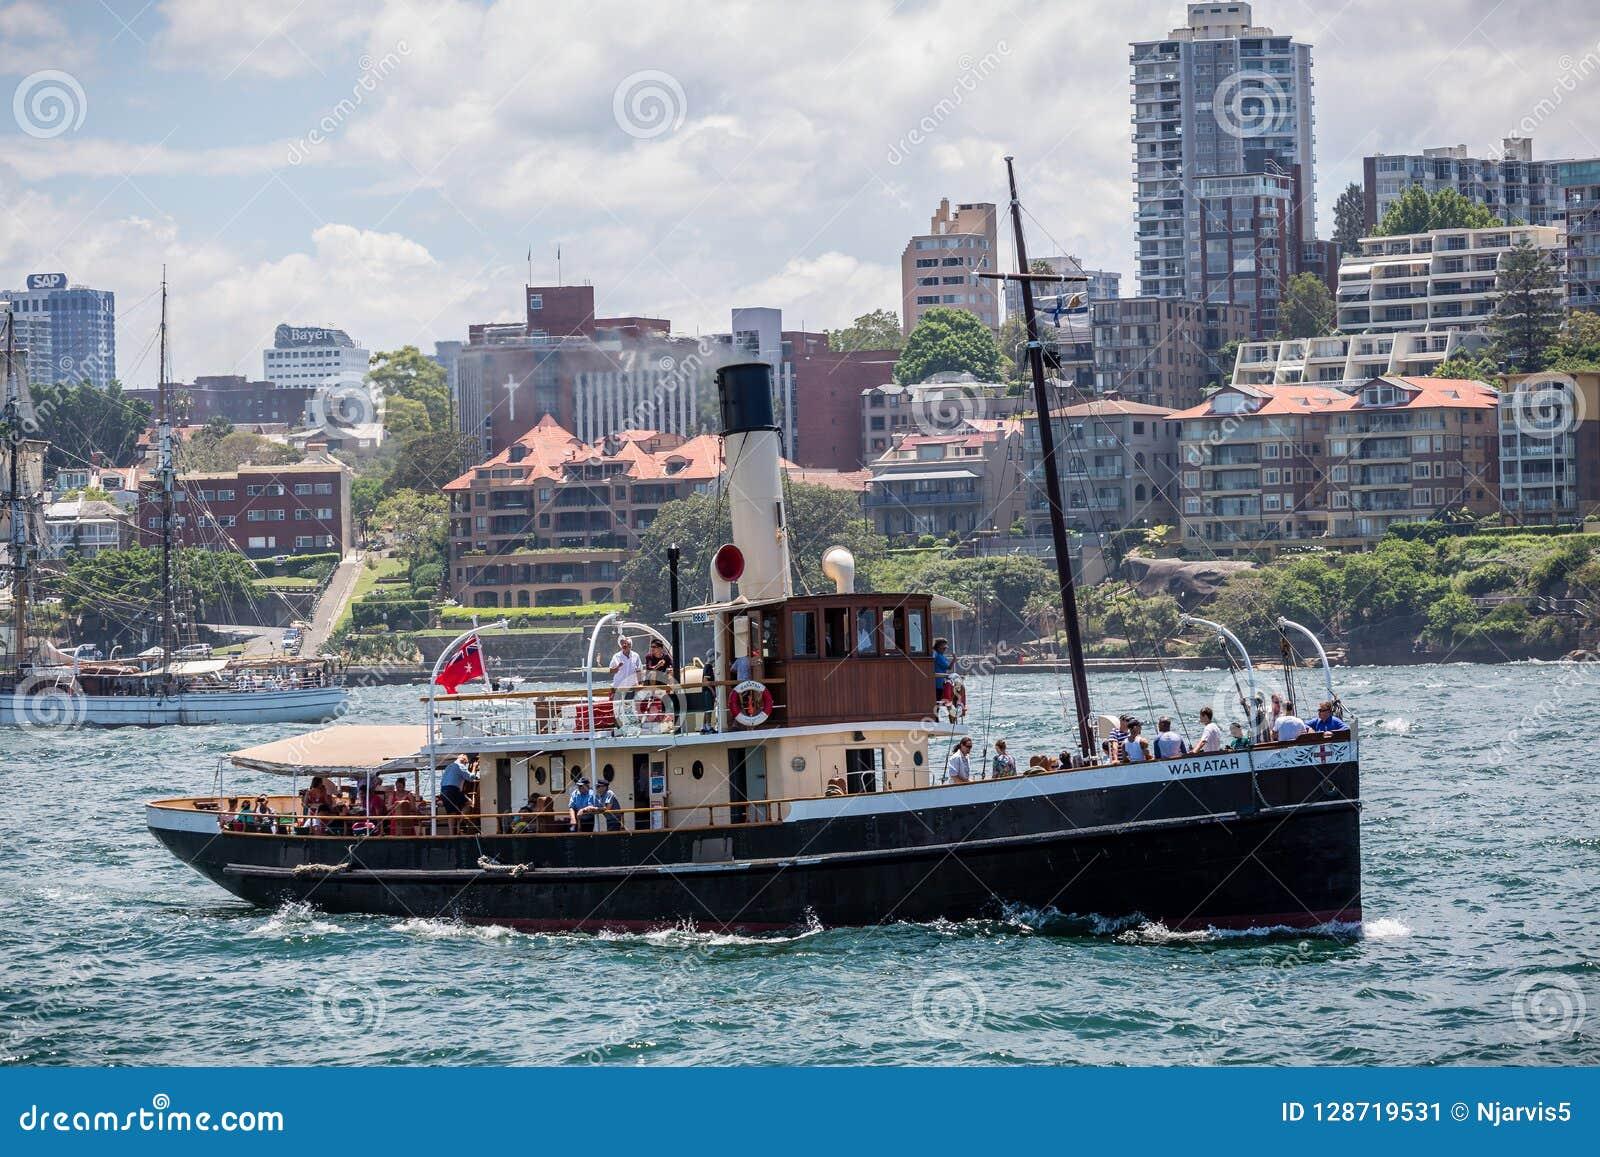 Steam Tug Waratah Steaming In Sydney Harbour, Sydney